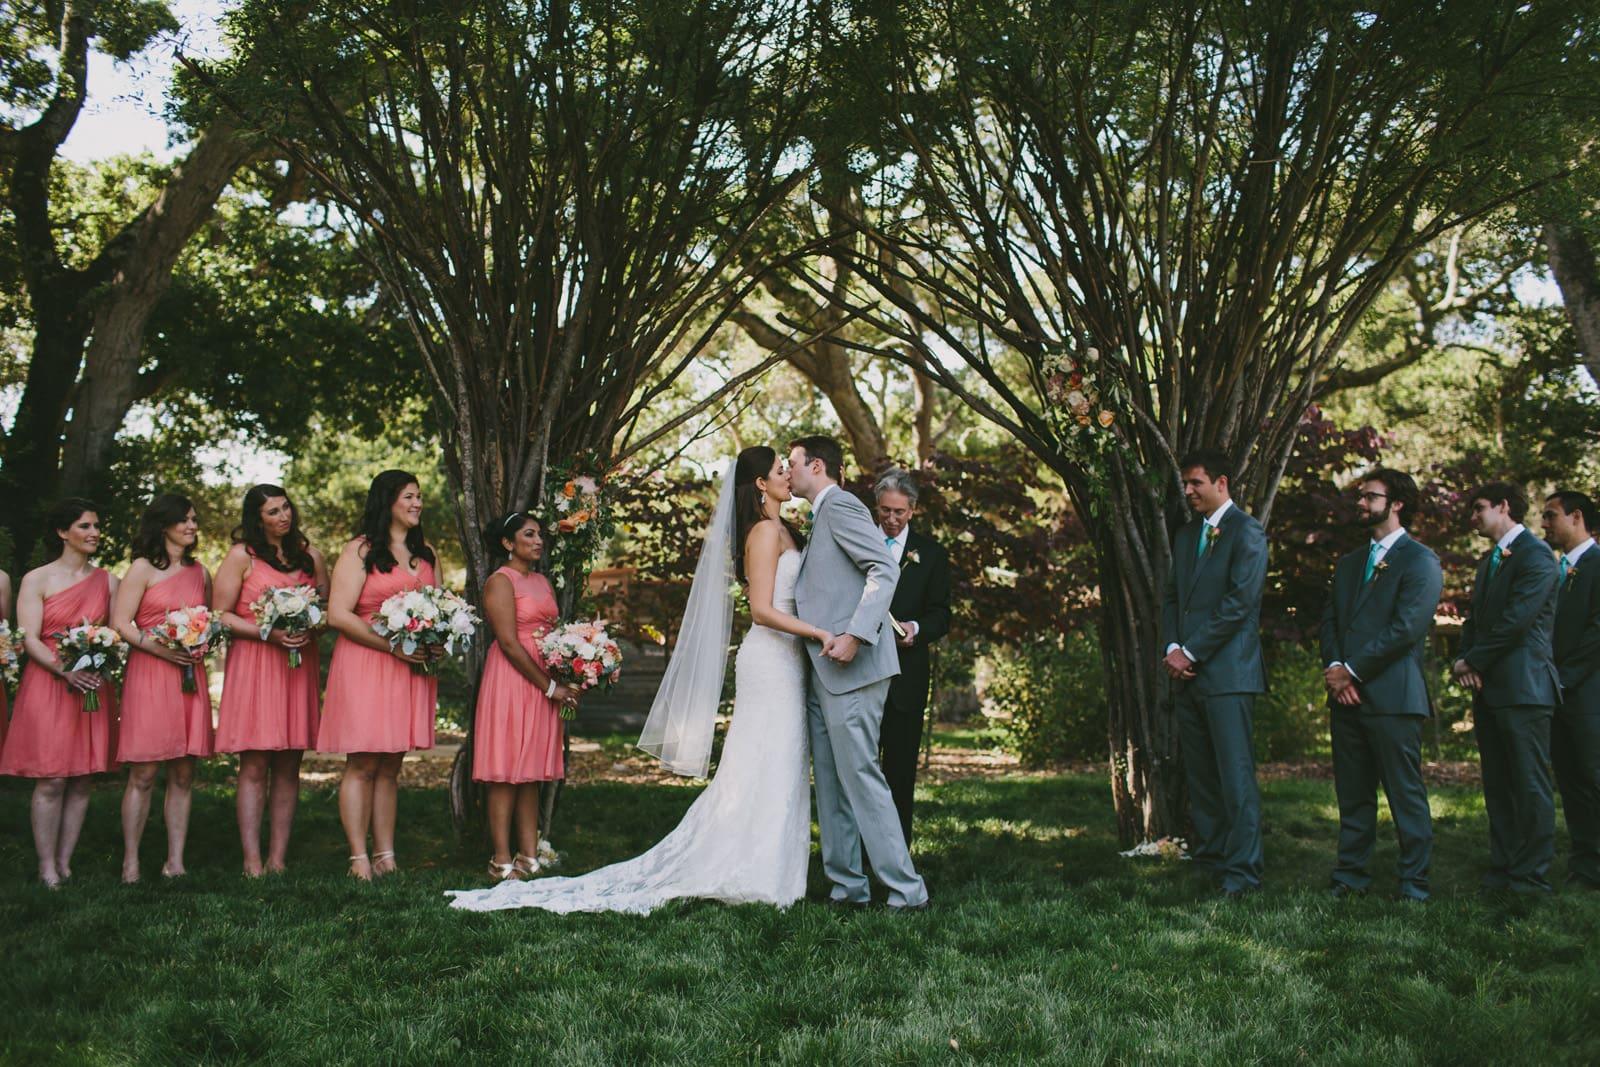 Carmel_Valley_Wedding_Gardener_Ranch_Wedding_026